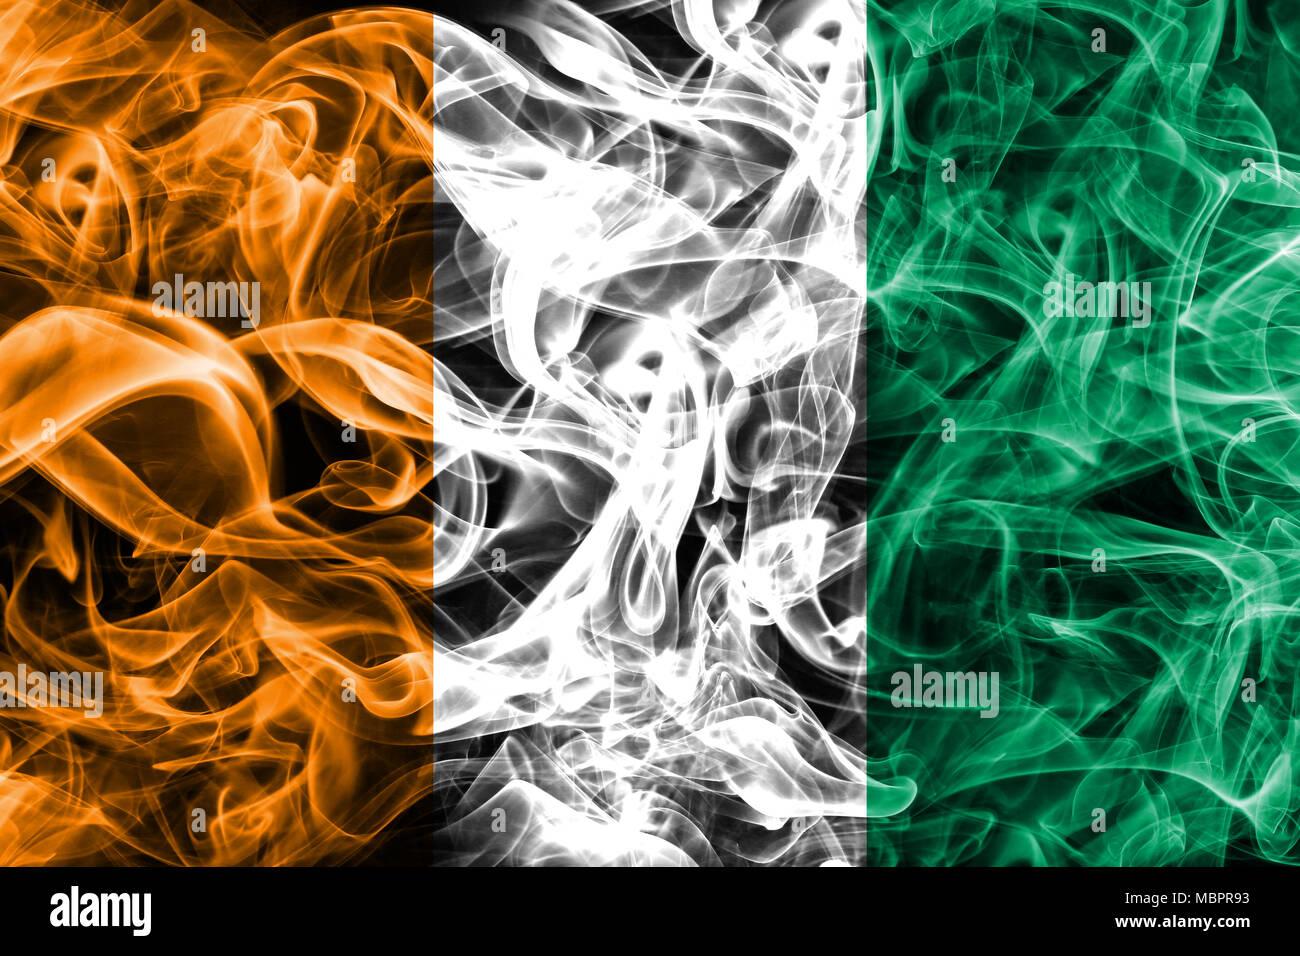 Côte d'Ivoire smoke flag - Stock Image